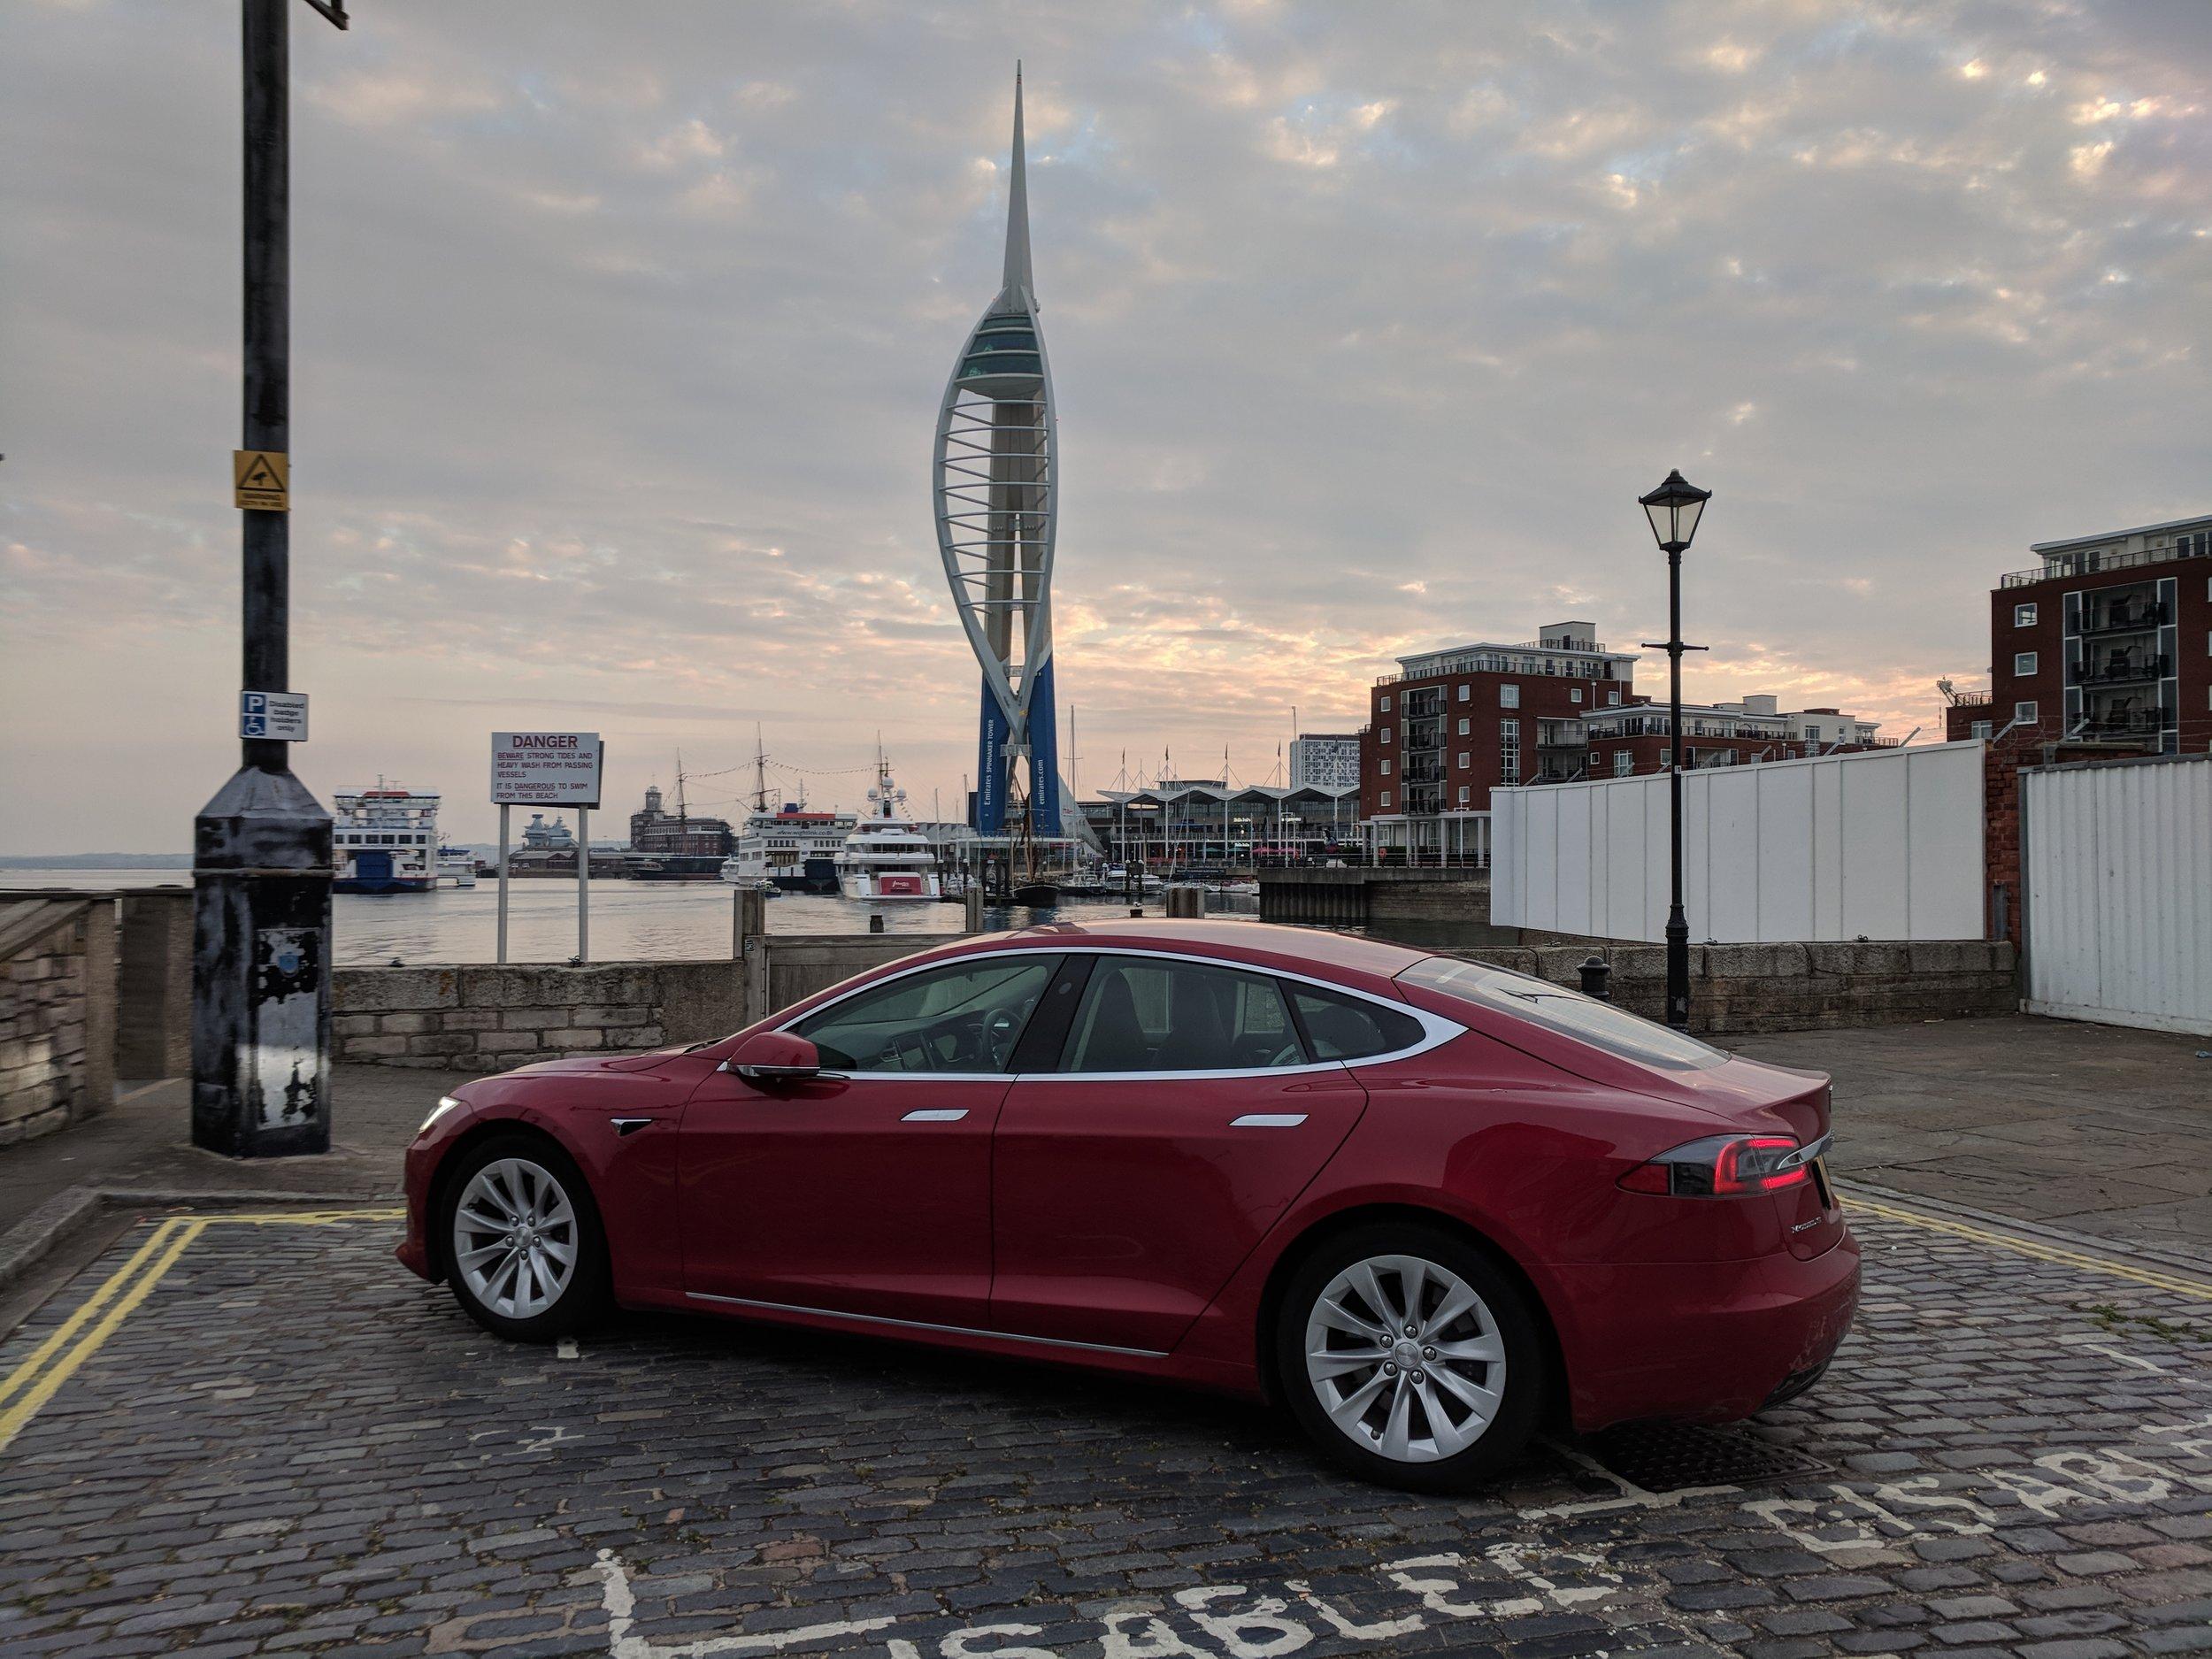 Tesla Model S - Spice Island